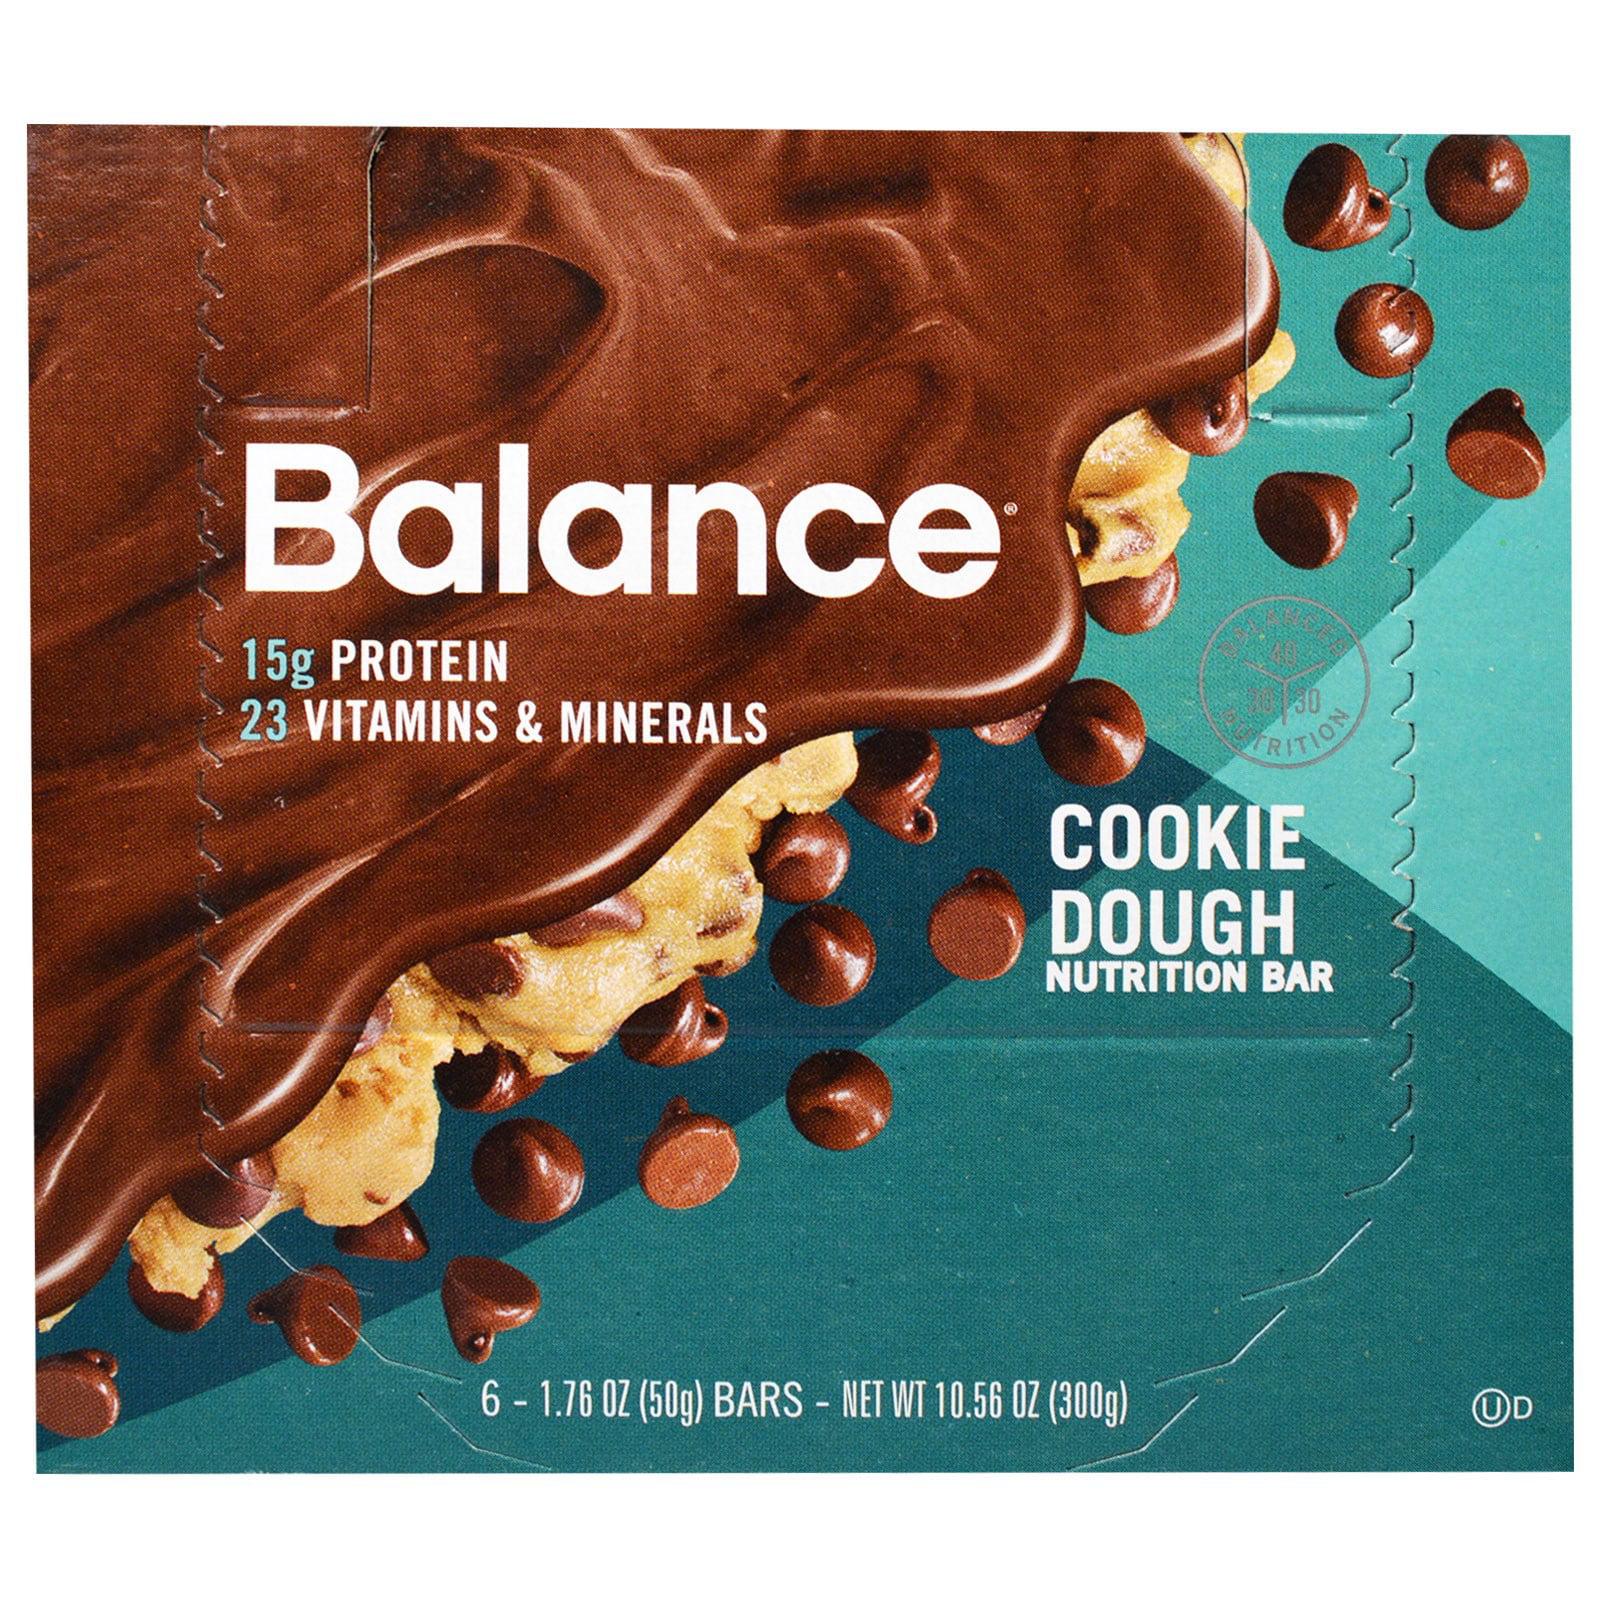 Balance Bar, Nutrition Bar, Cookie Dough, 6 Bars, 1.76 oz (50 g) Each(pack of 12) by